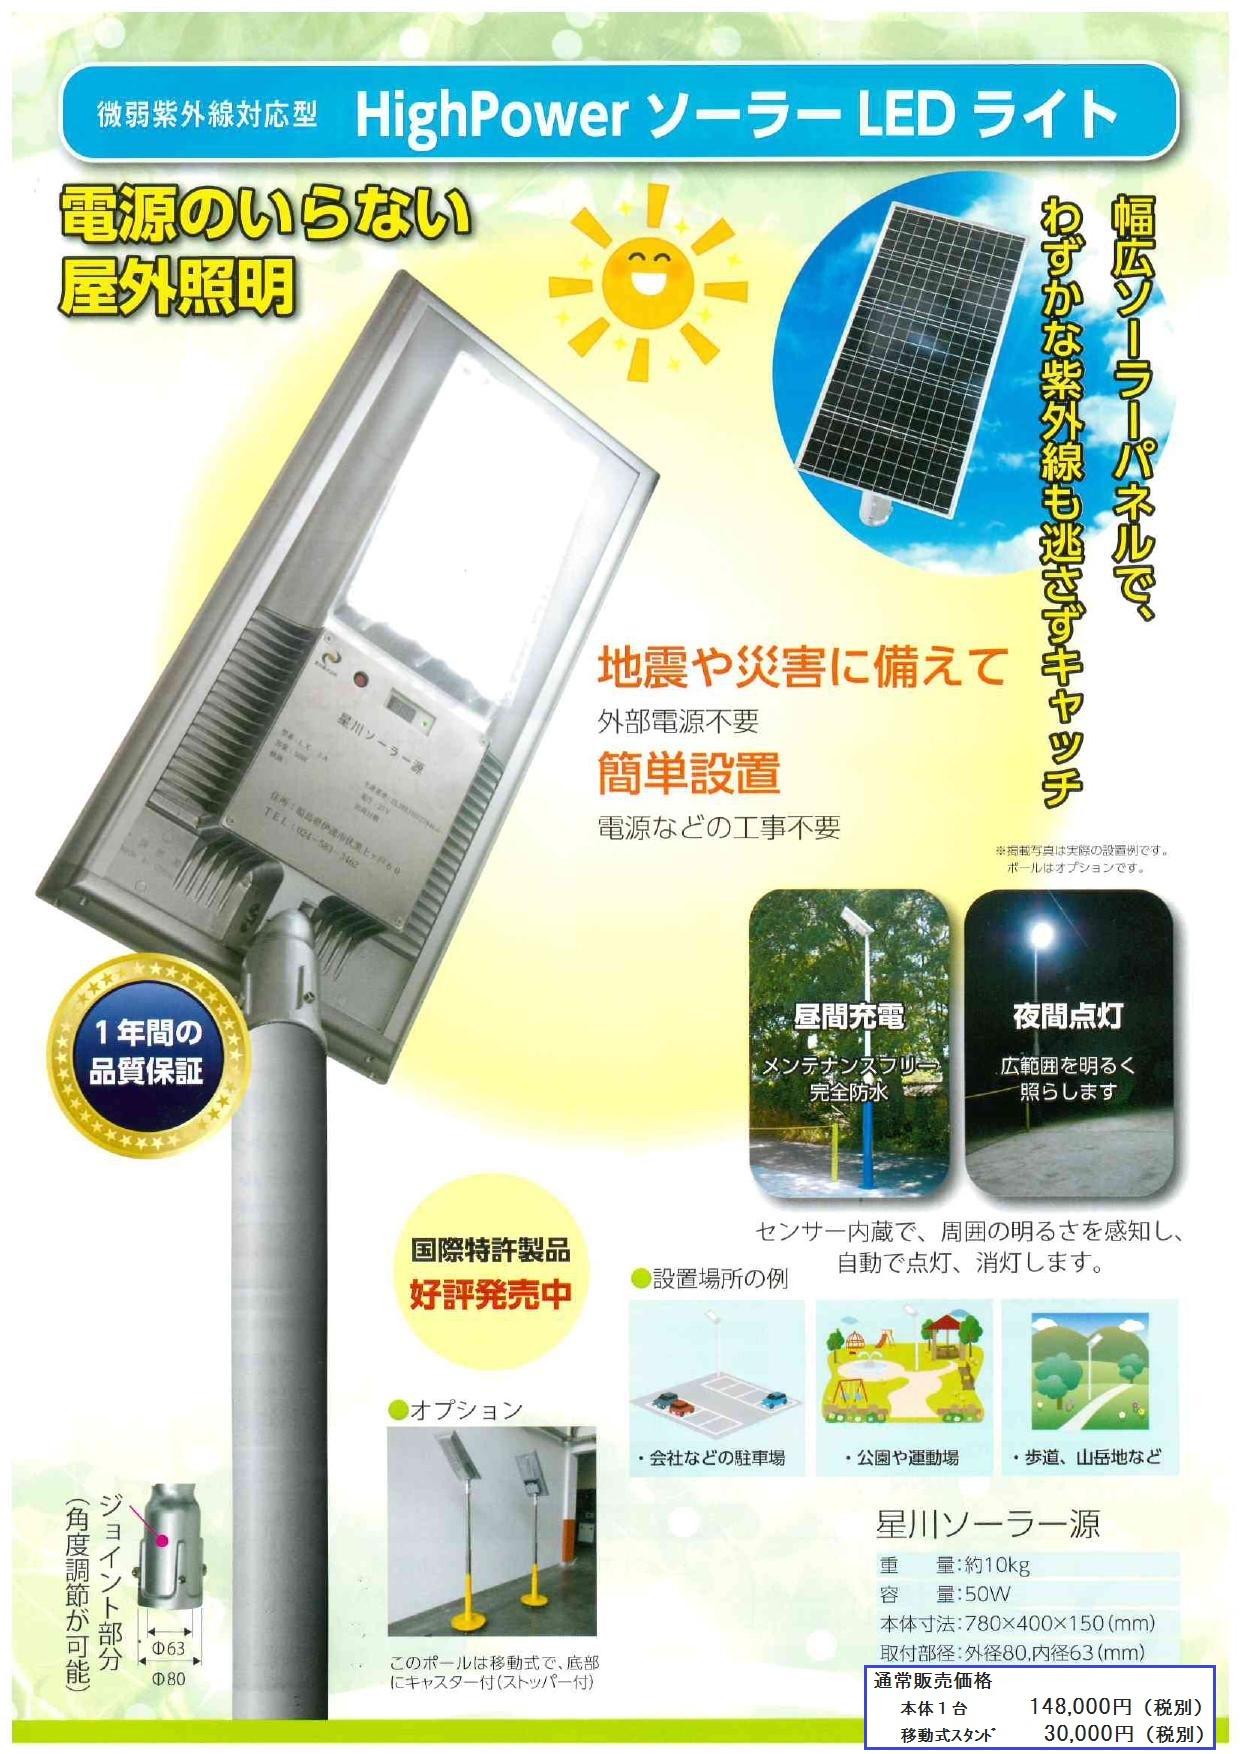 LEDチラシ(印刷)_000001